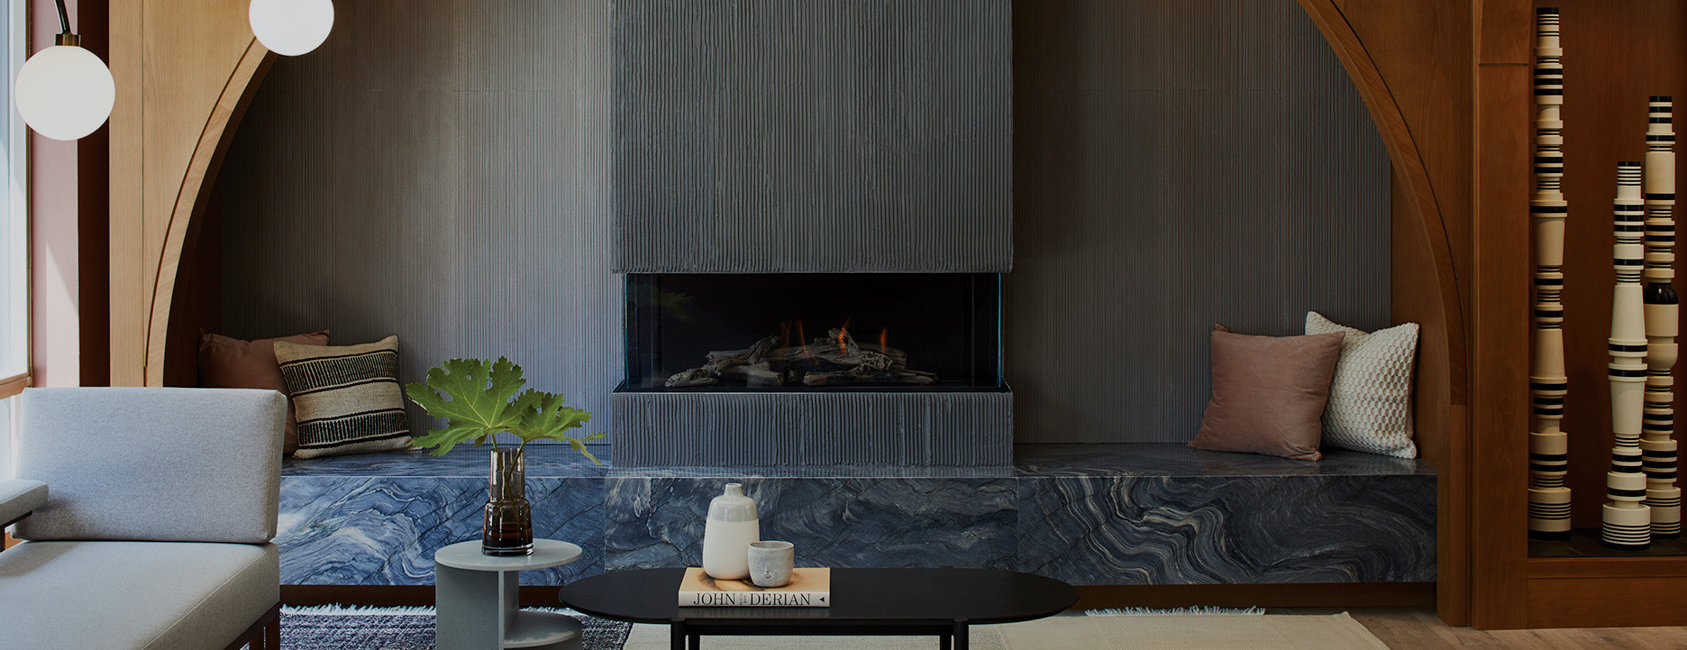 Interior Design Show 2020